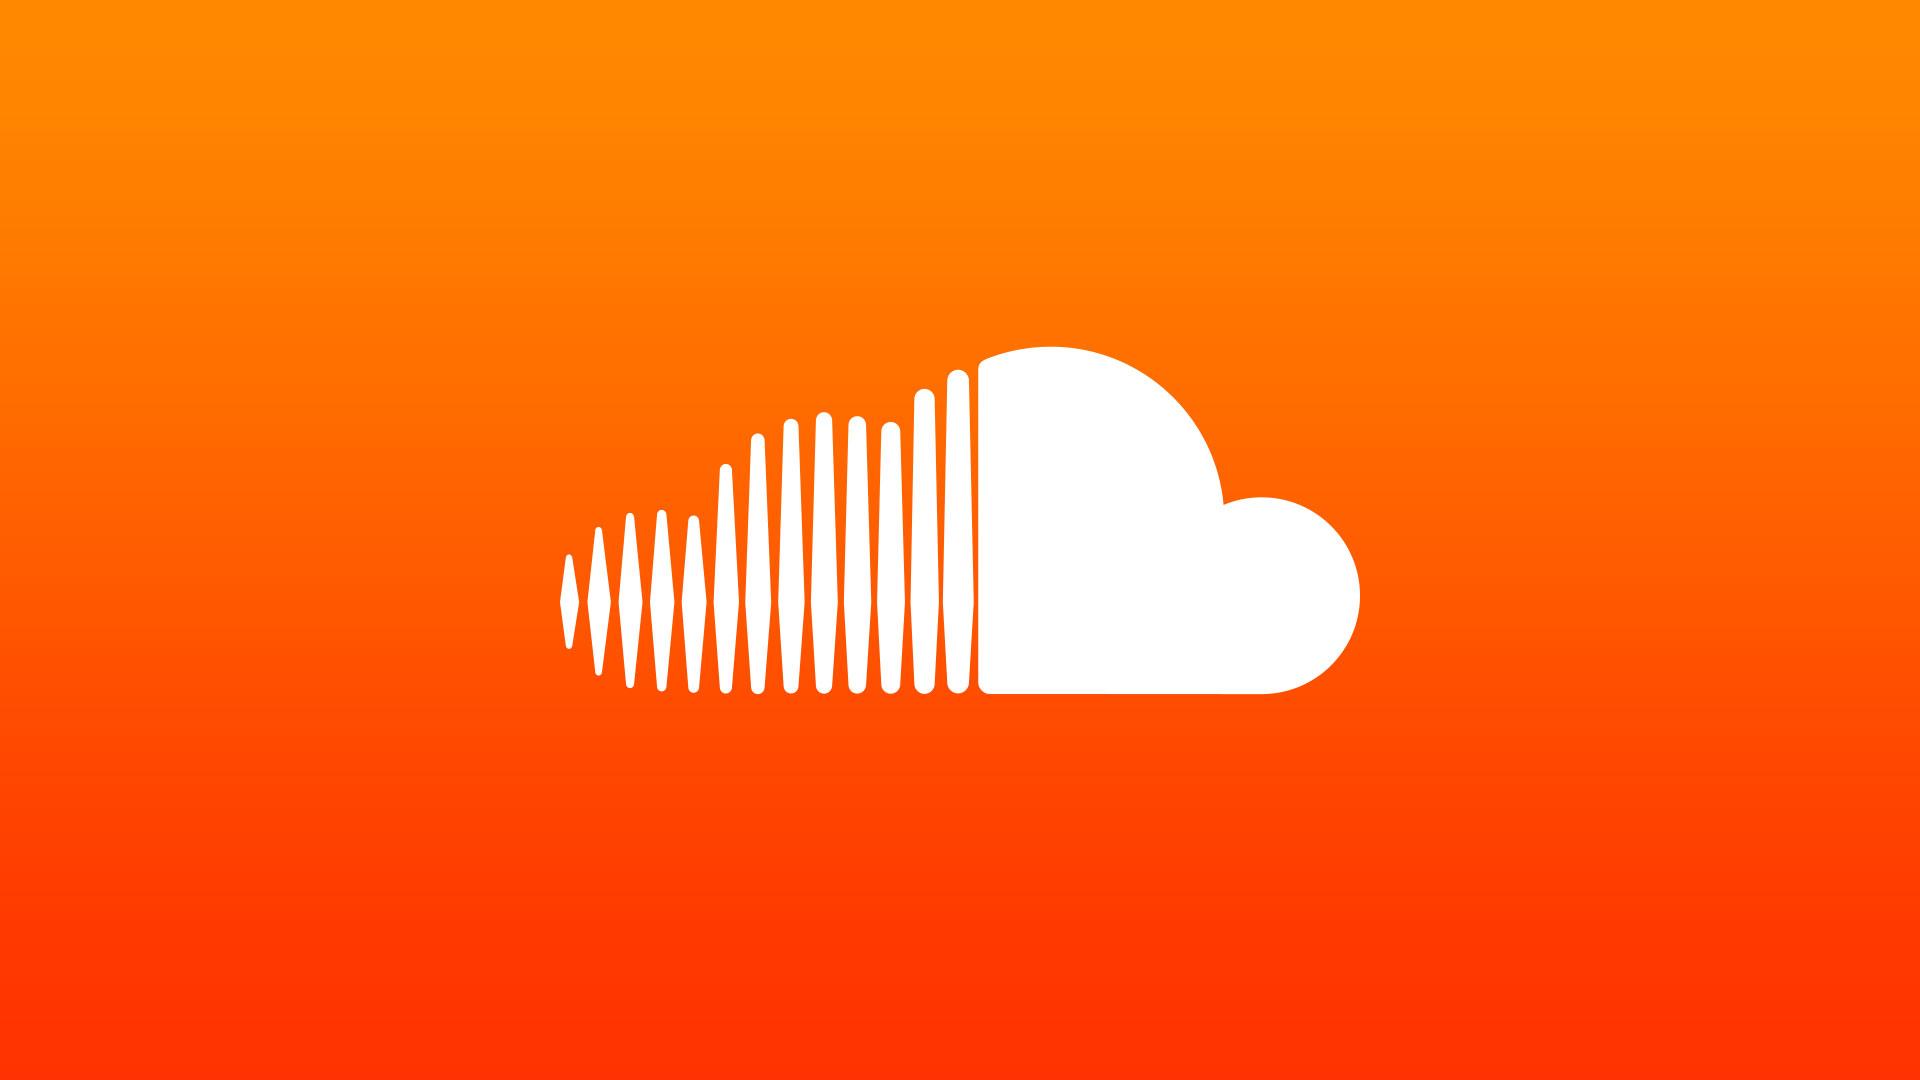 soundcloud-logo-hd-wallpaper-66510-68778-hd-wallpapers.jpg